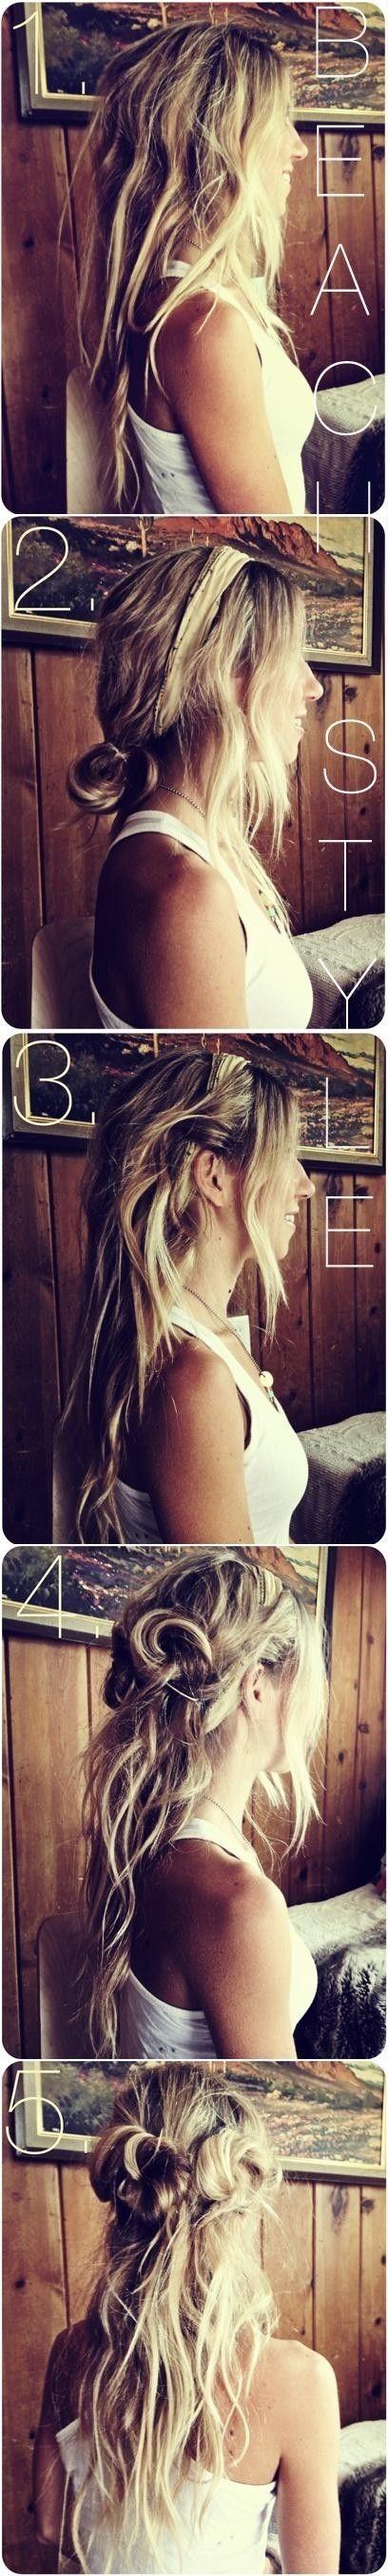 Langes Haar-Tutorials: Niedlich Chaotisch Strand-Frisuren Langes Haar-Tutorials: Niedlich Chaotisch Strand-Frisuren - http://www.2017frisuren.com/langes-haar-tutorials-niedlich-chaotisch-strand-frisuren/